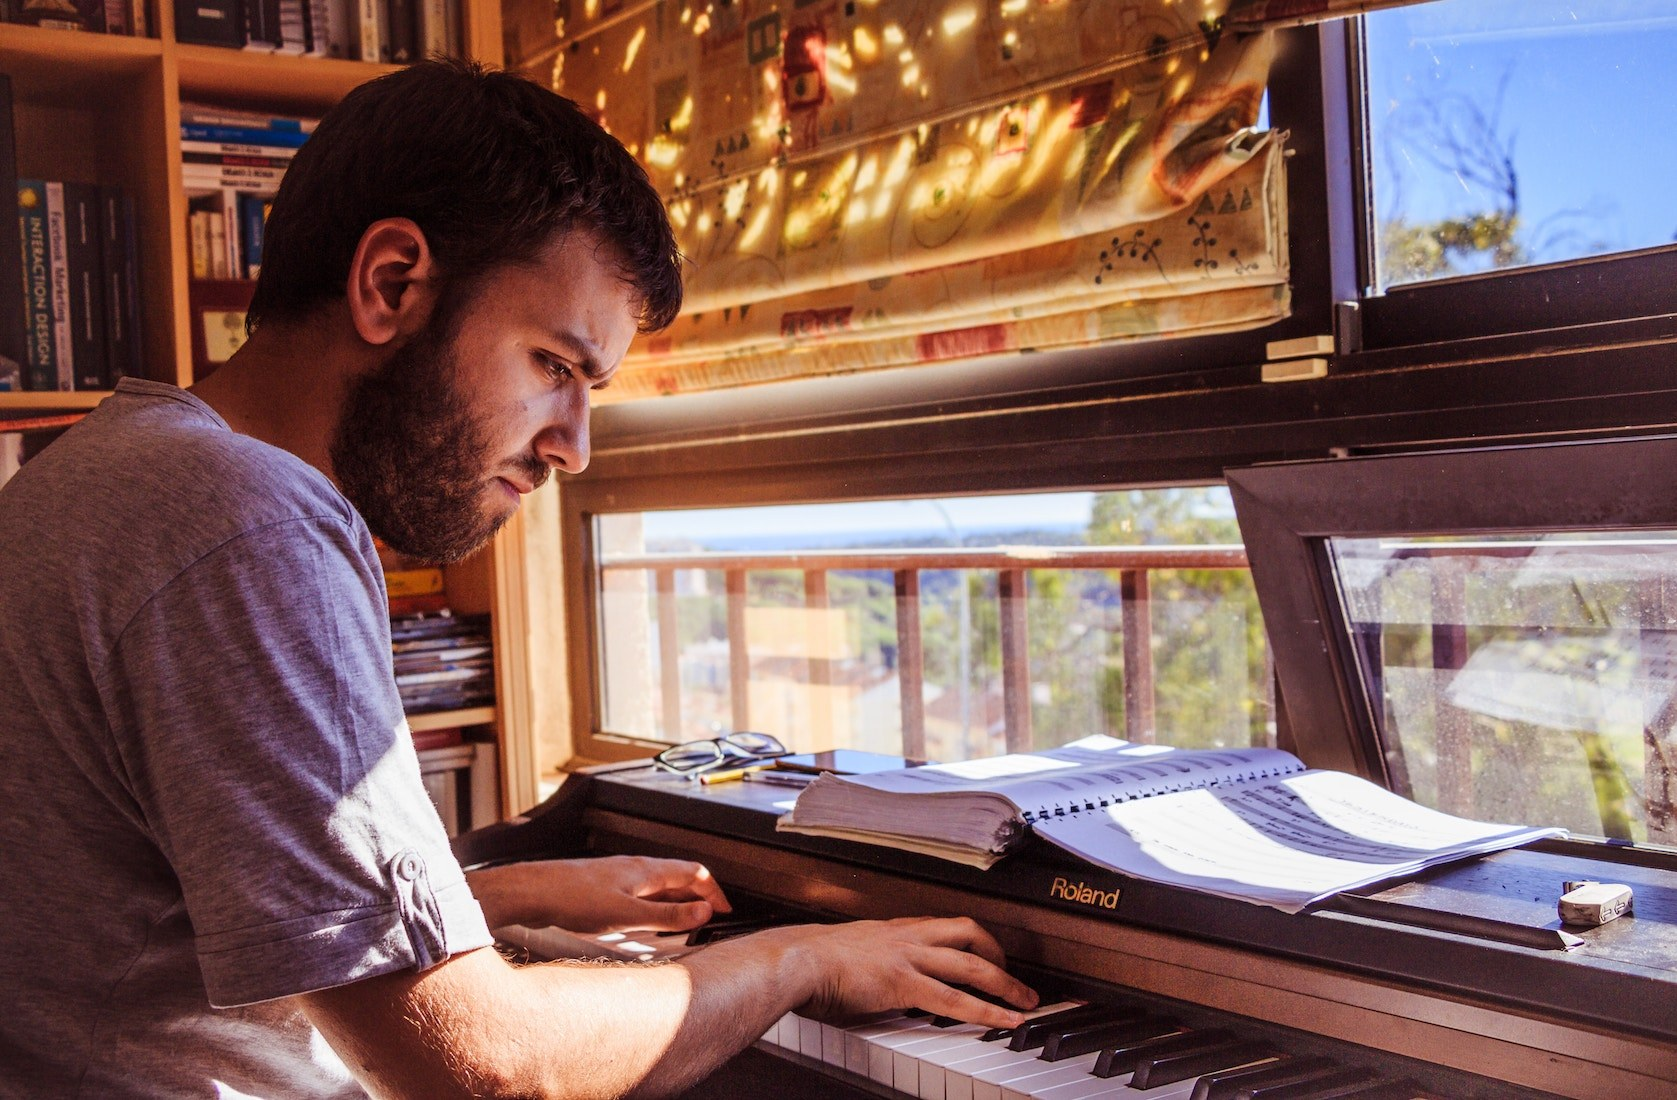 Clases de piano moderno en Madrid en A Píntega Marela